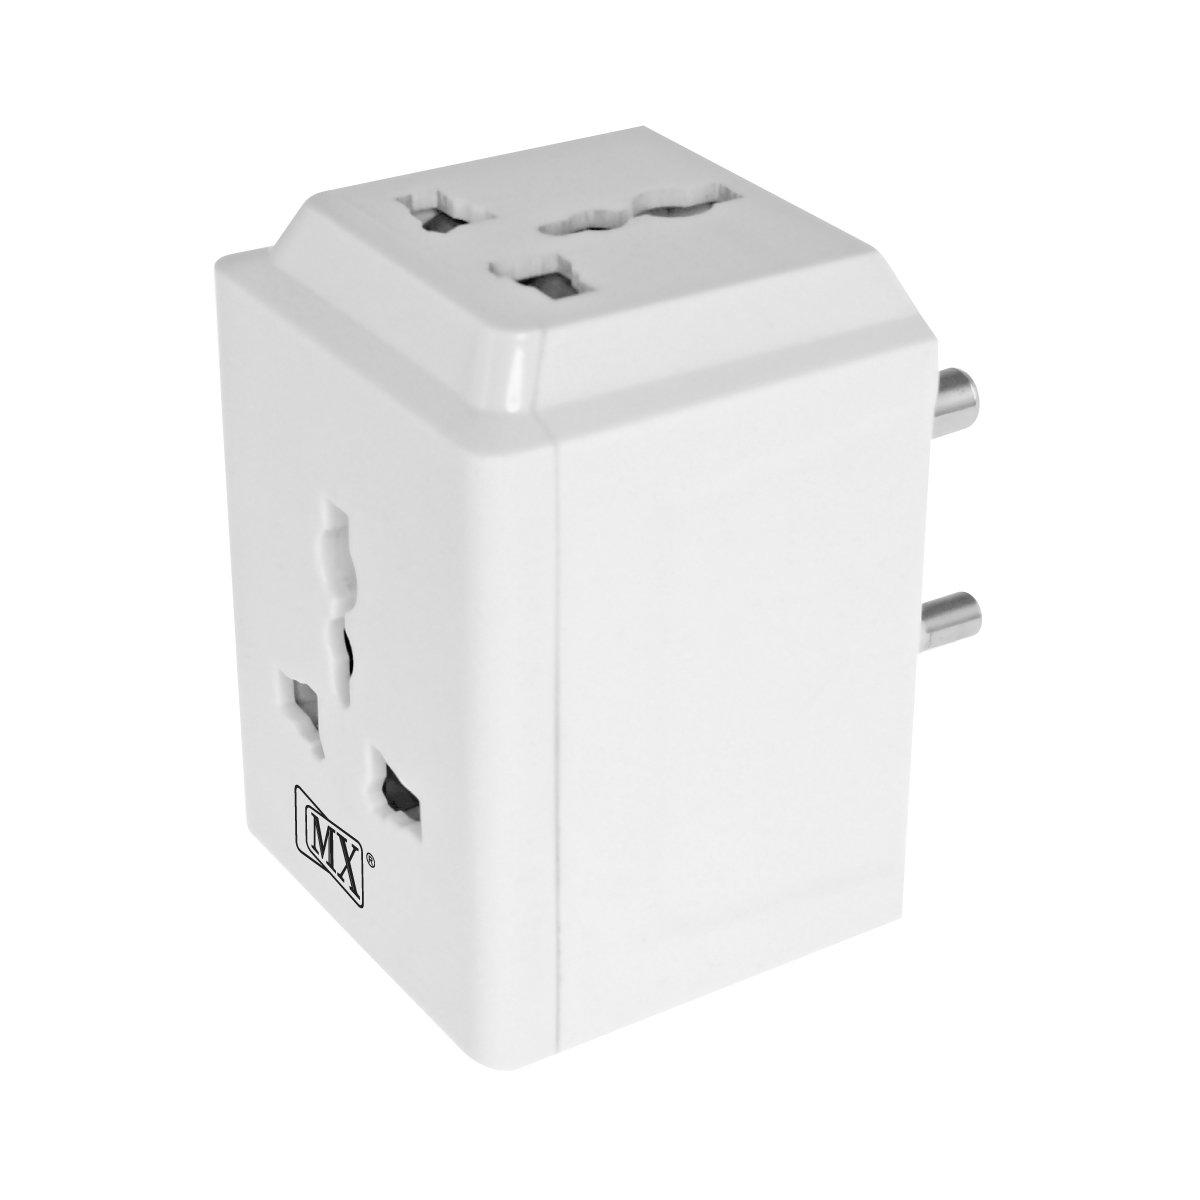 MX 3865 3 PIN 3 Way Universal Multi Plug